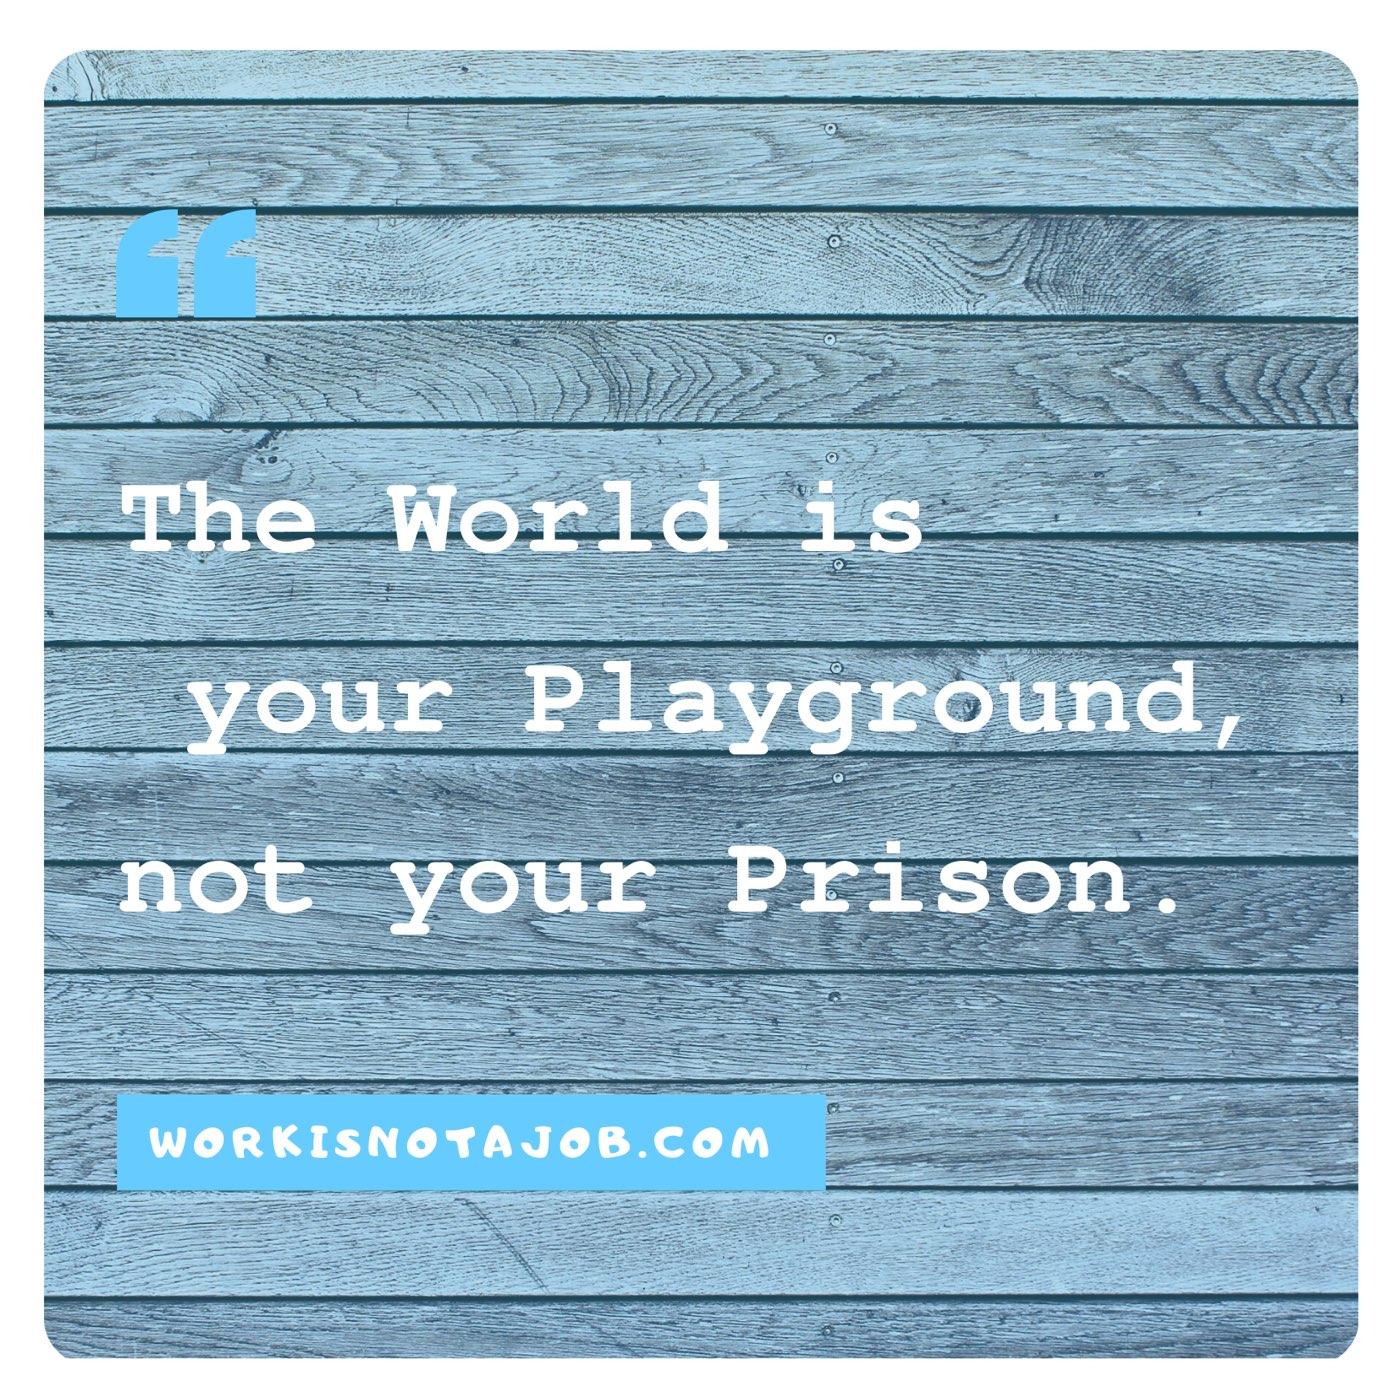 WorkIsNotAJob: Playground